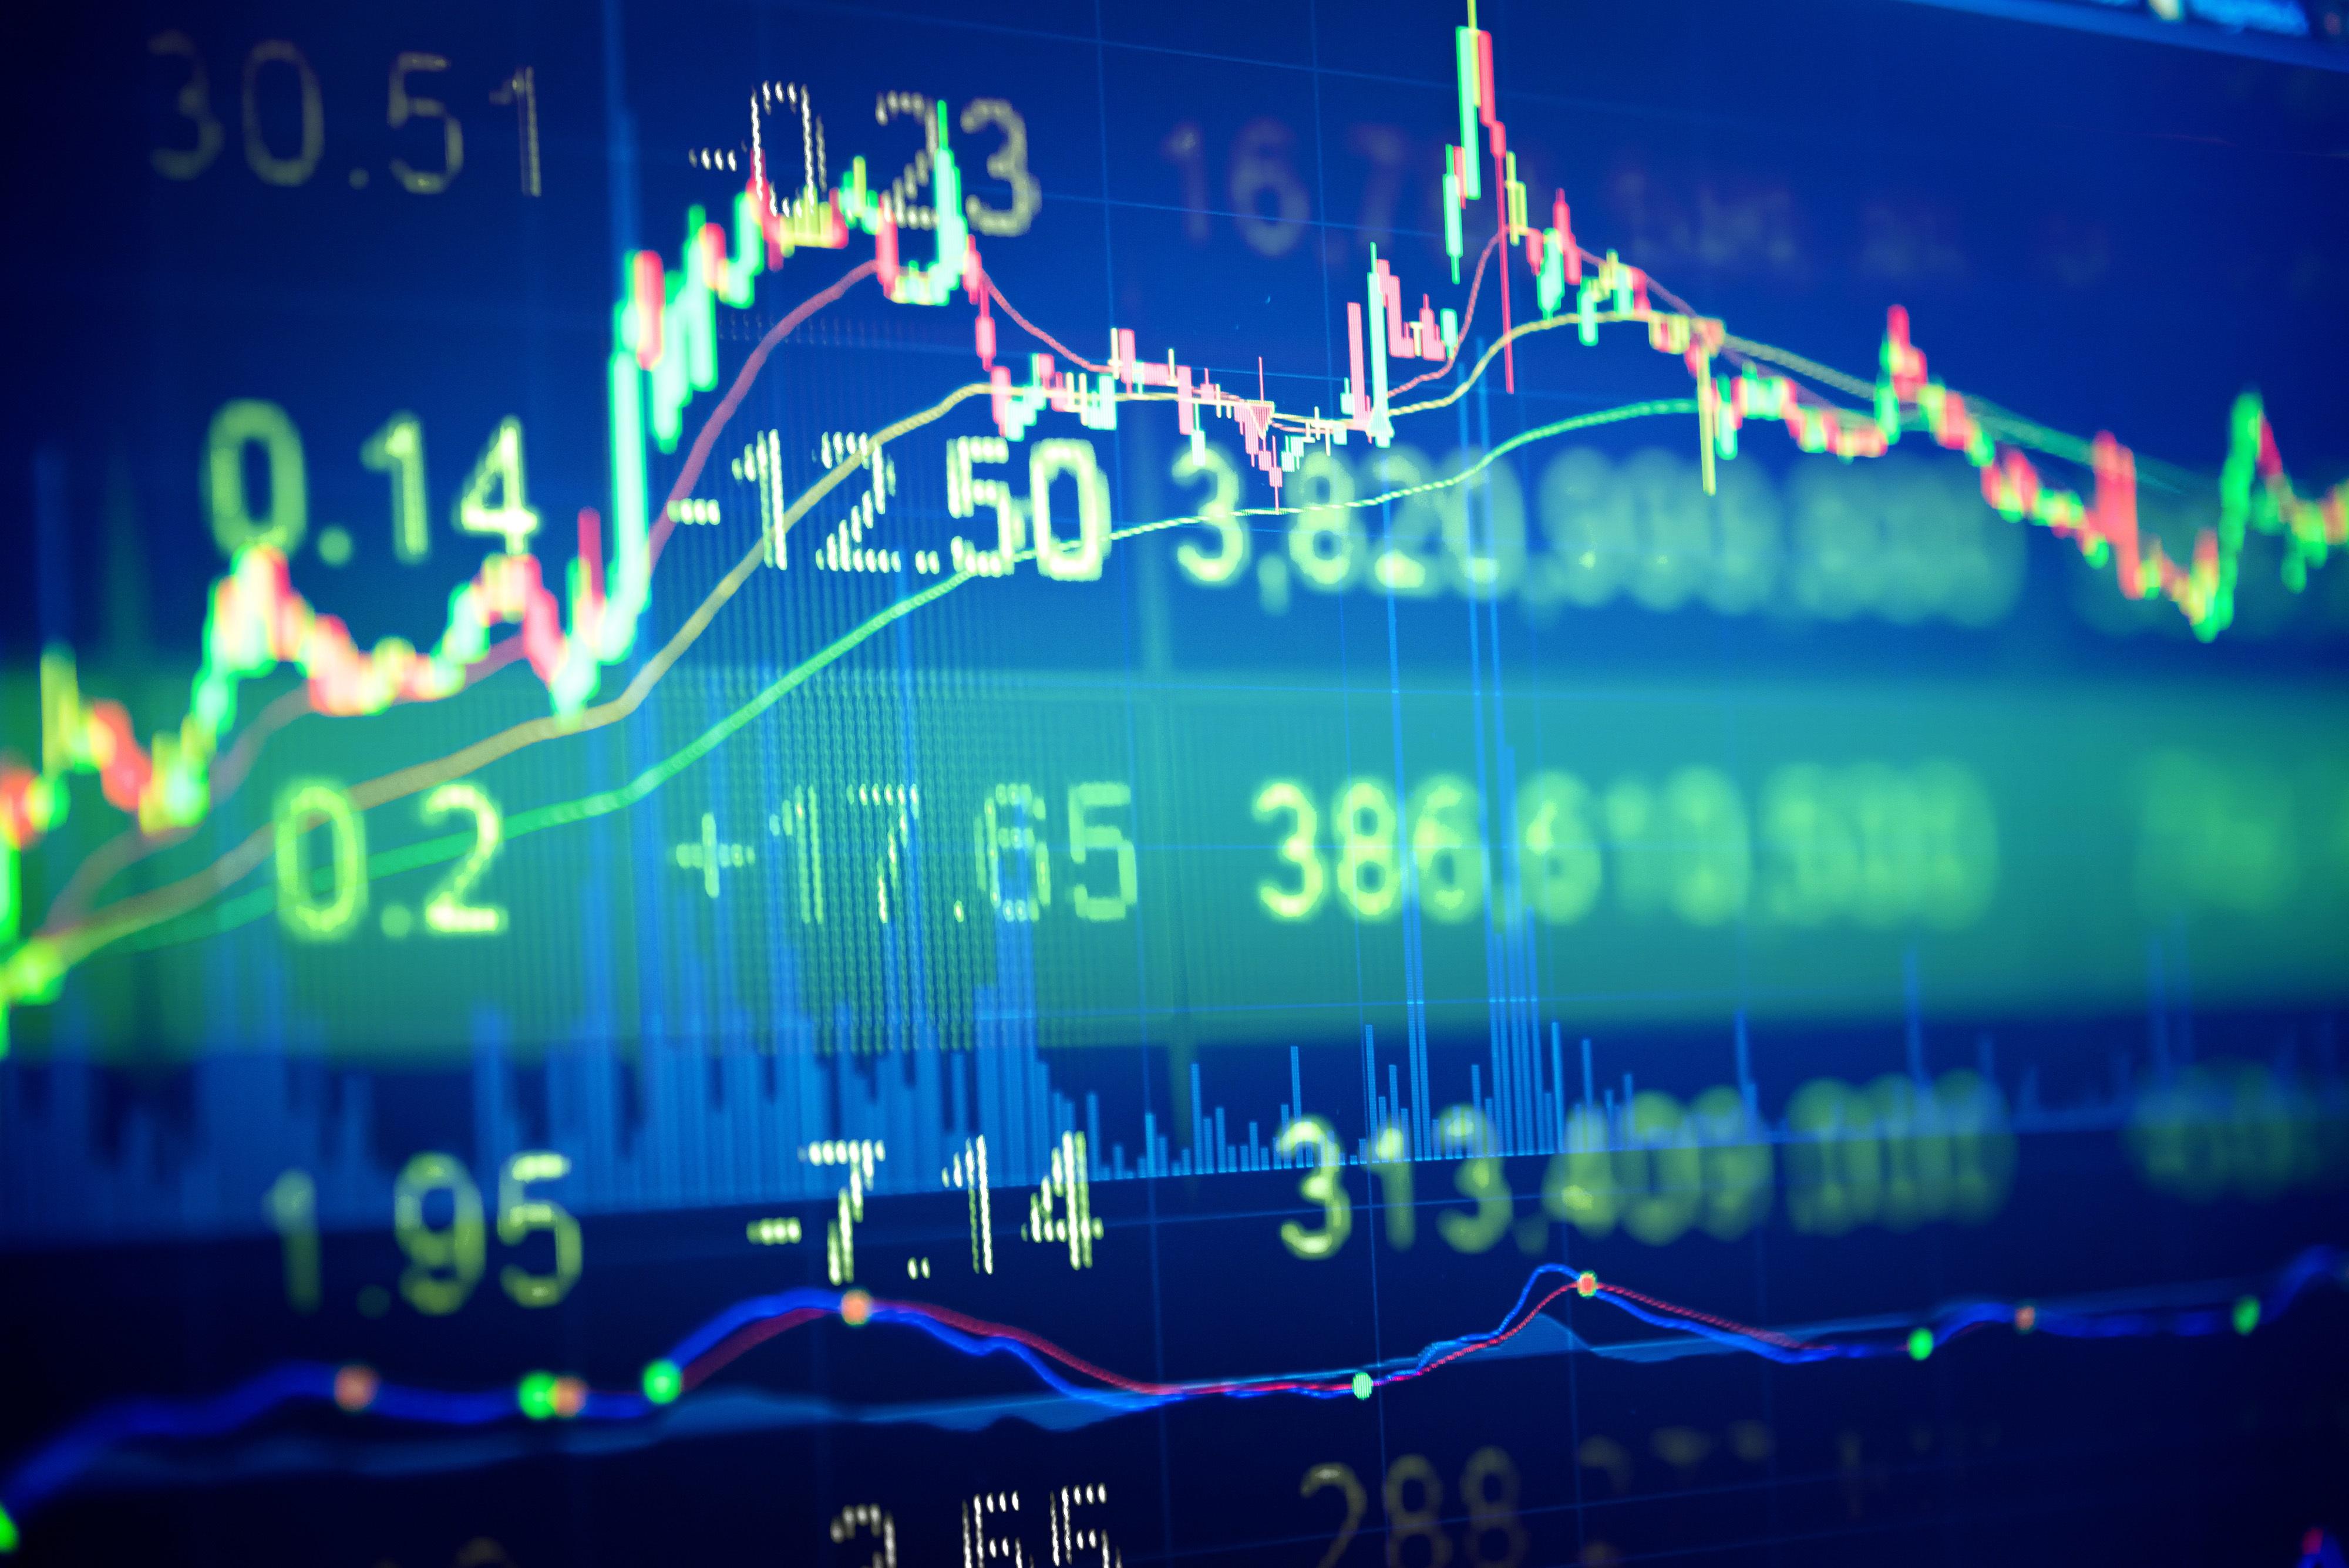 Stocks trading on screen